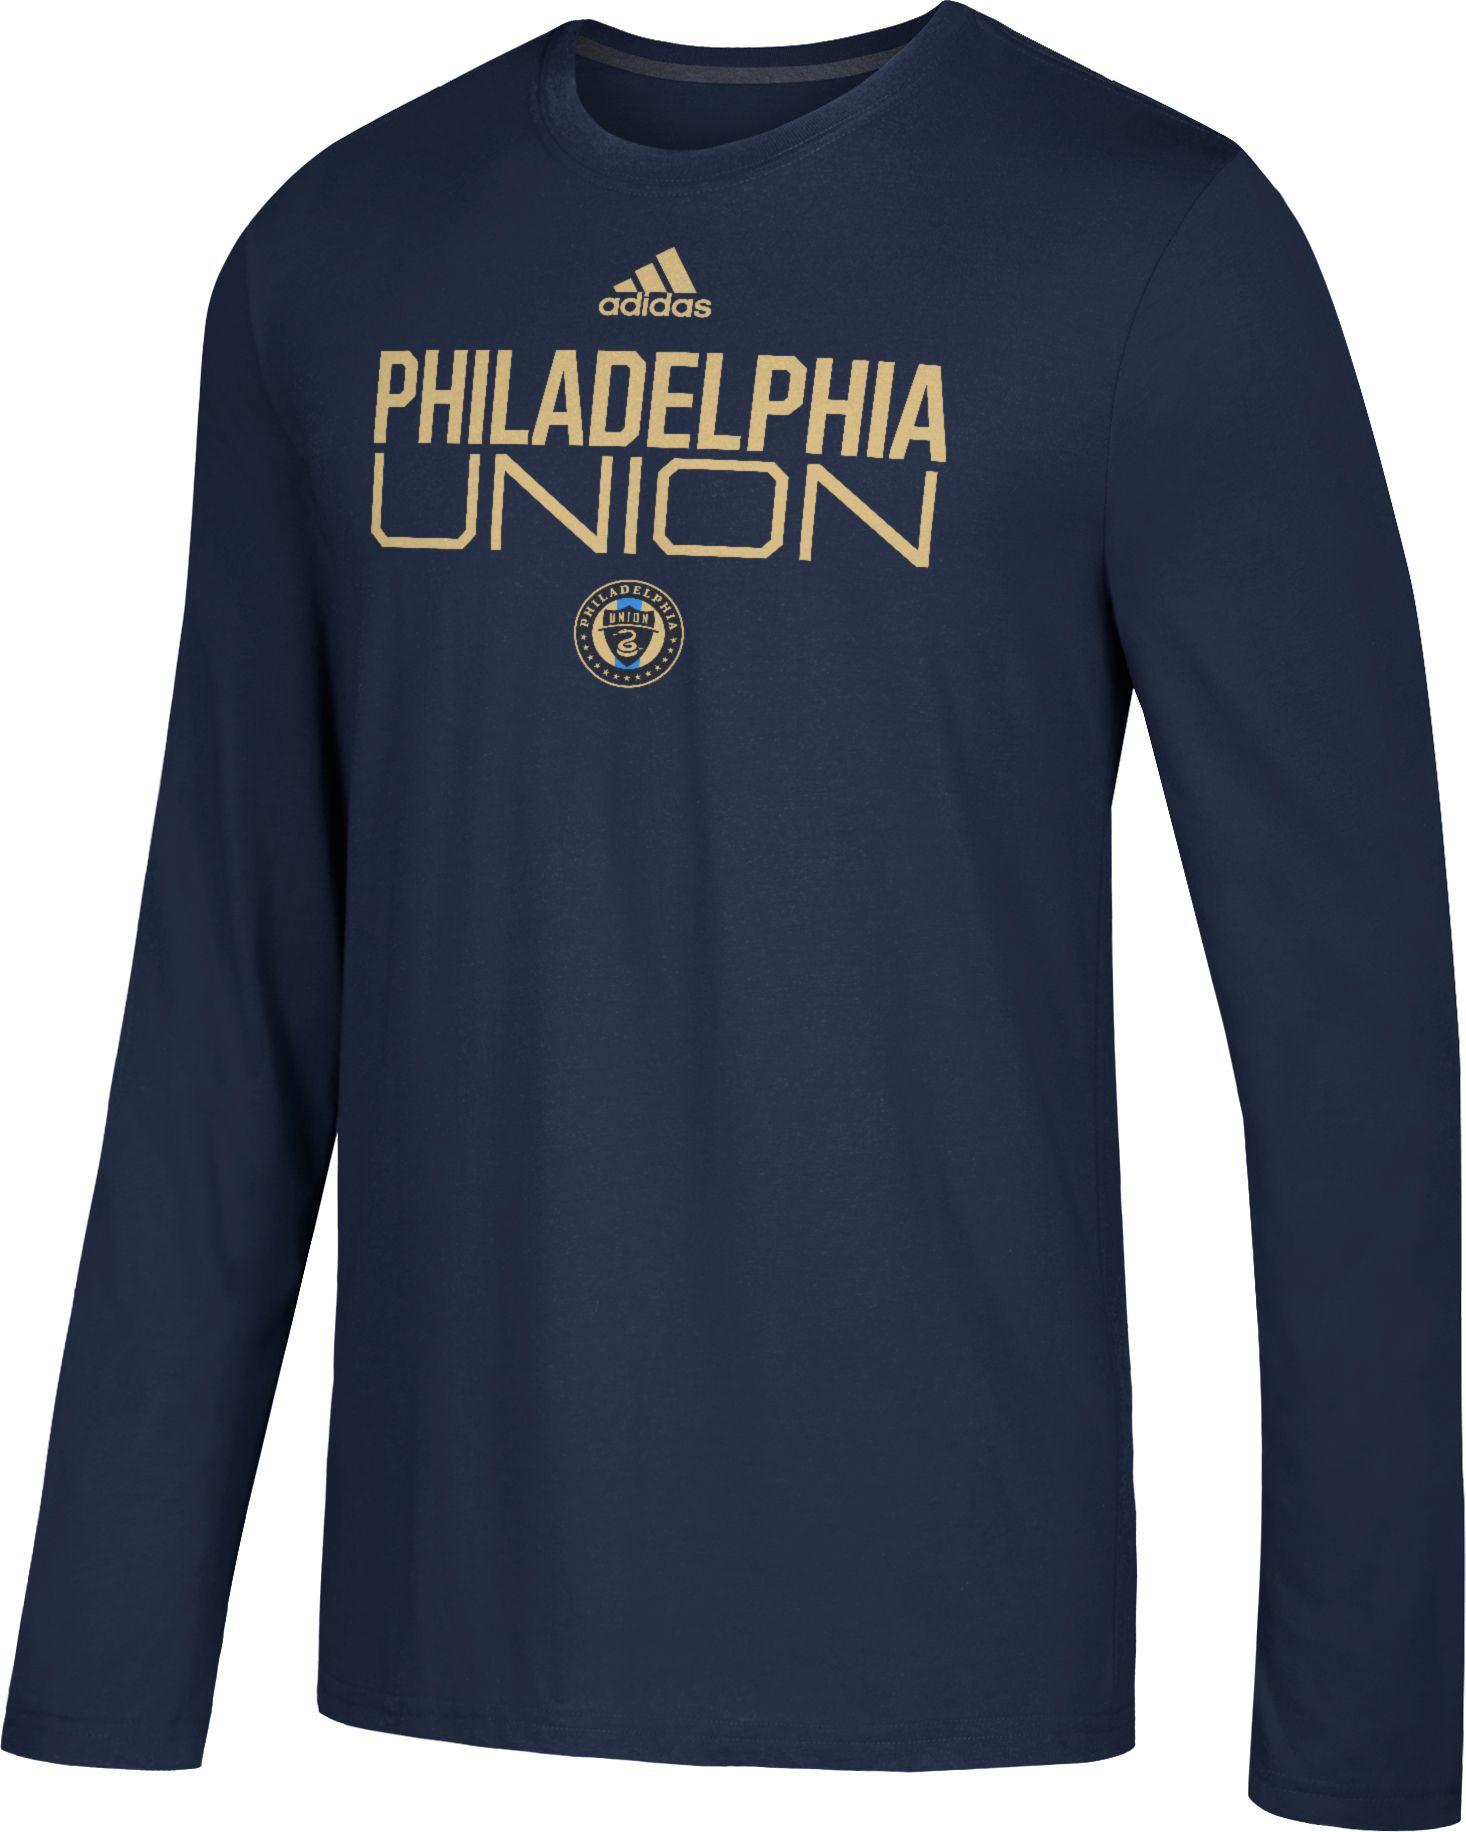 buy popular a9a1b edbc9 adidas Men's Philadelphia Union Logo Performance Navy Long Sleeve Shirt